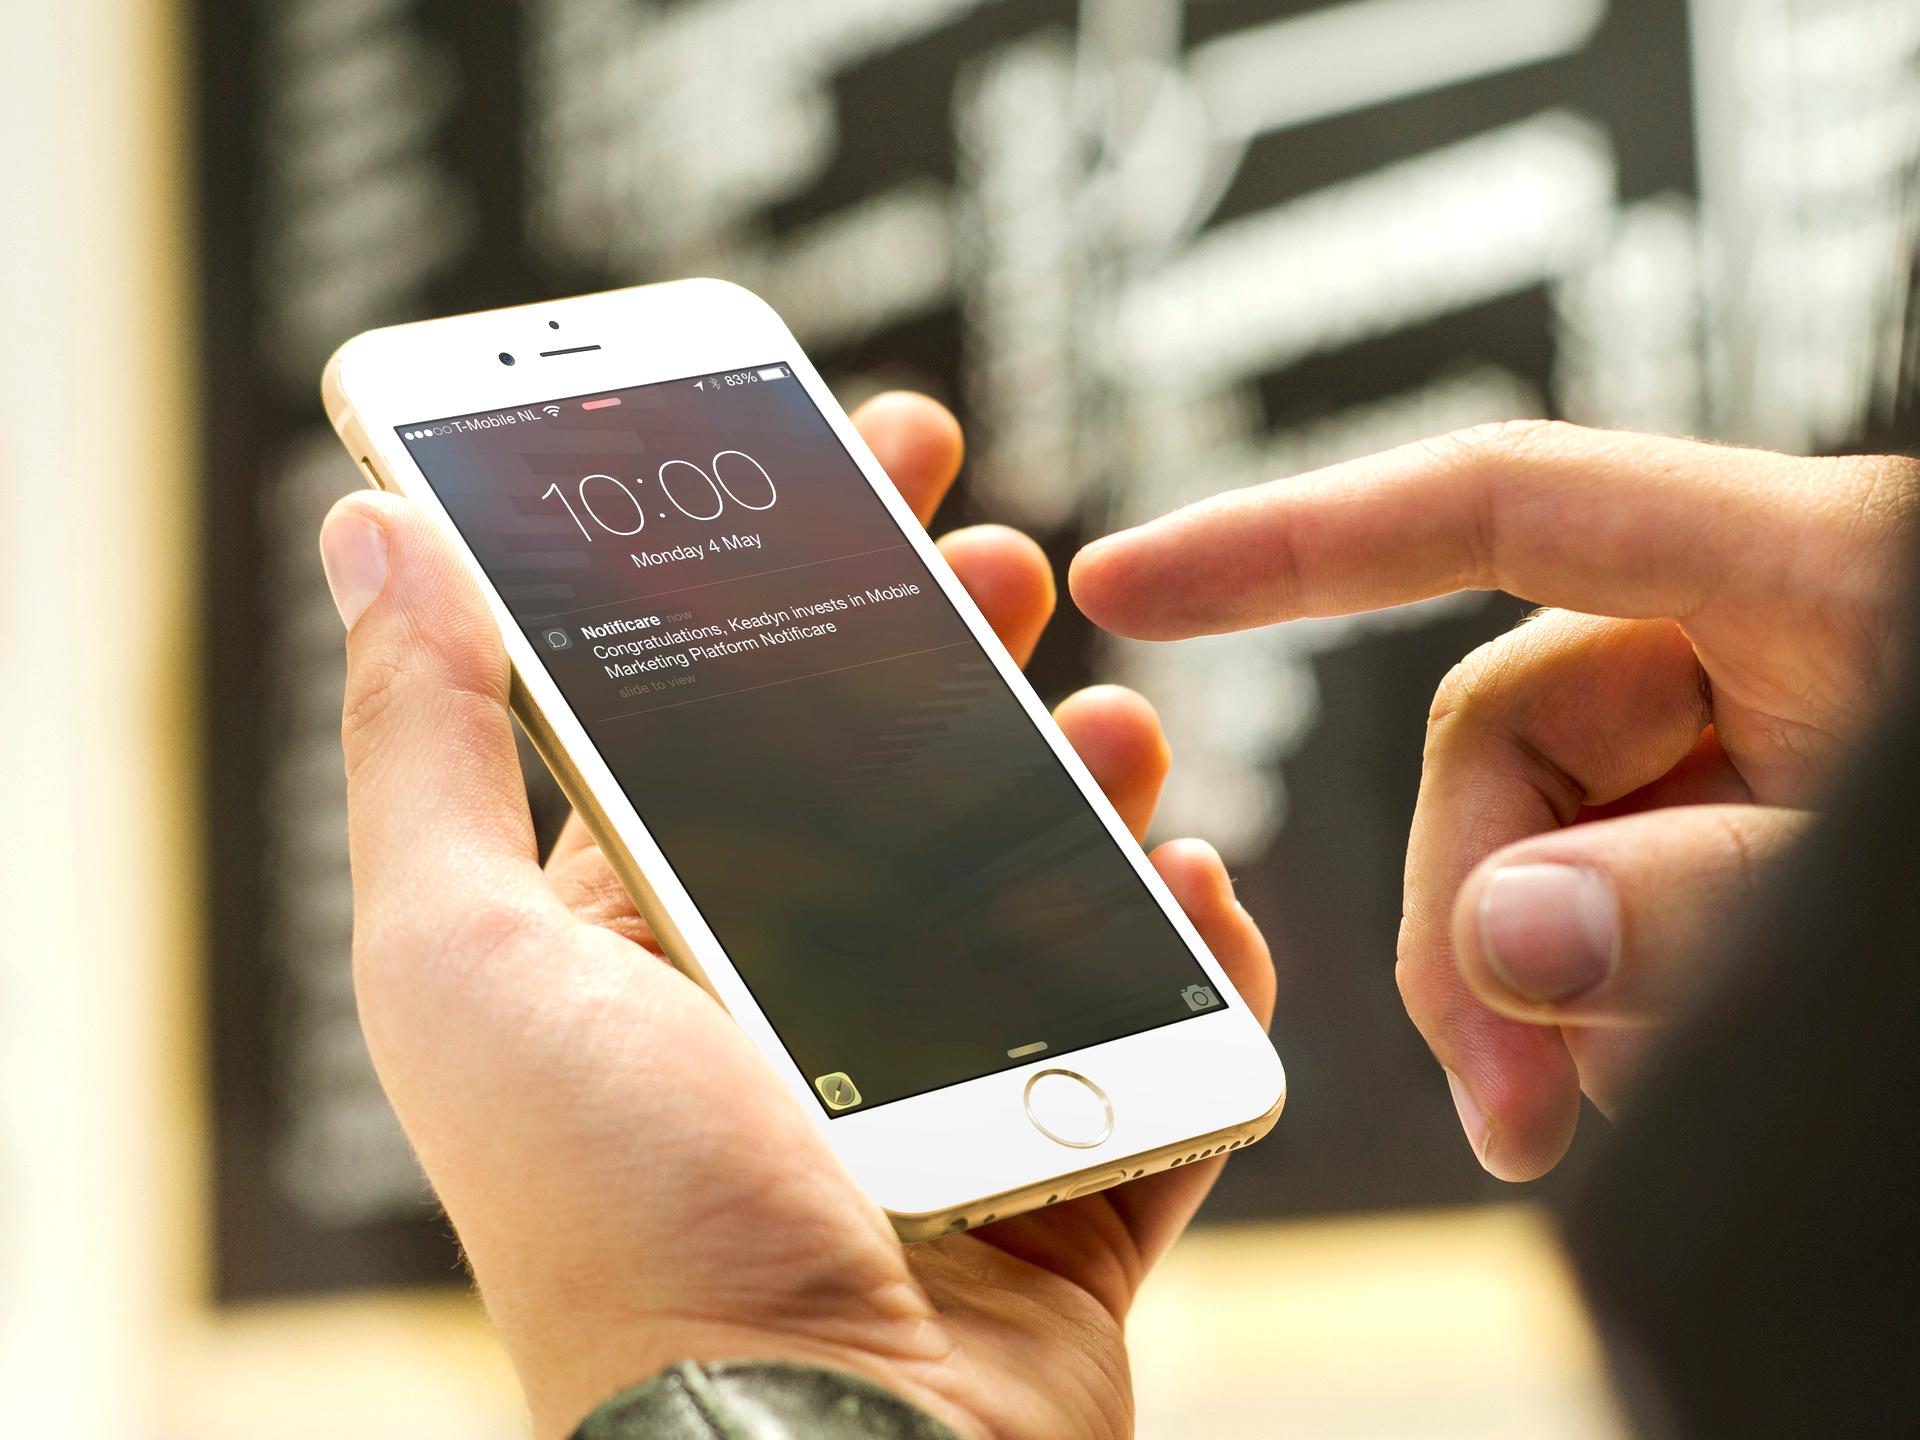 165547 keadyn invests in mobile%20marketing platform%20notificare 4132d9 original 1430727473